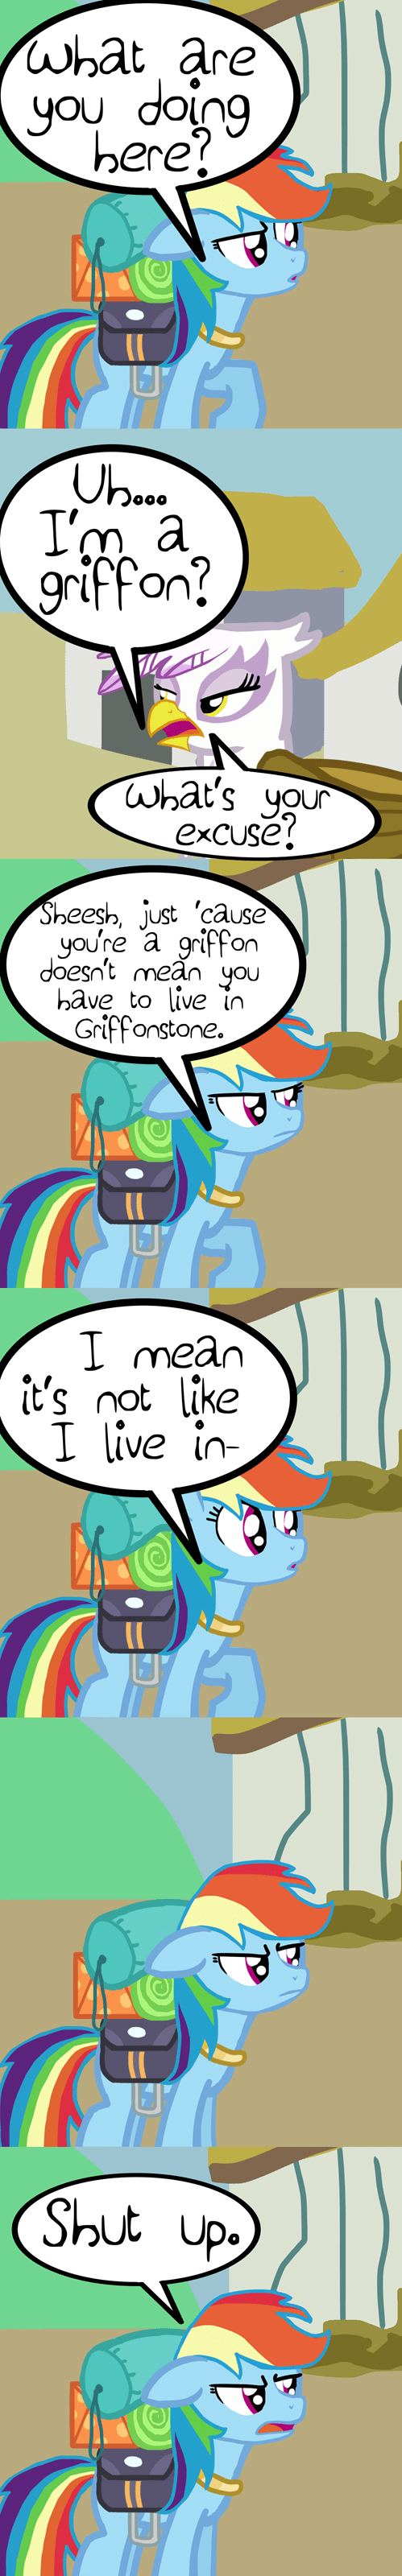 ponyville gilda rainbow dash web comics - 8499371008